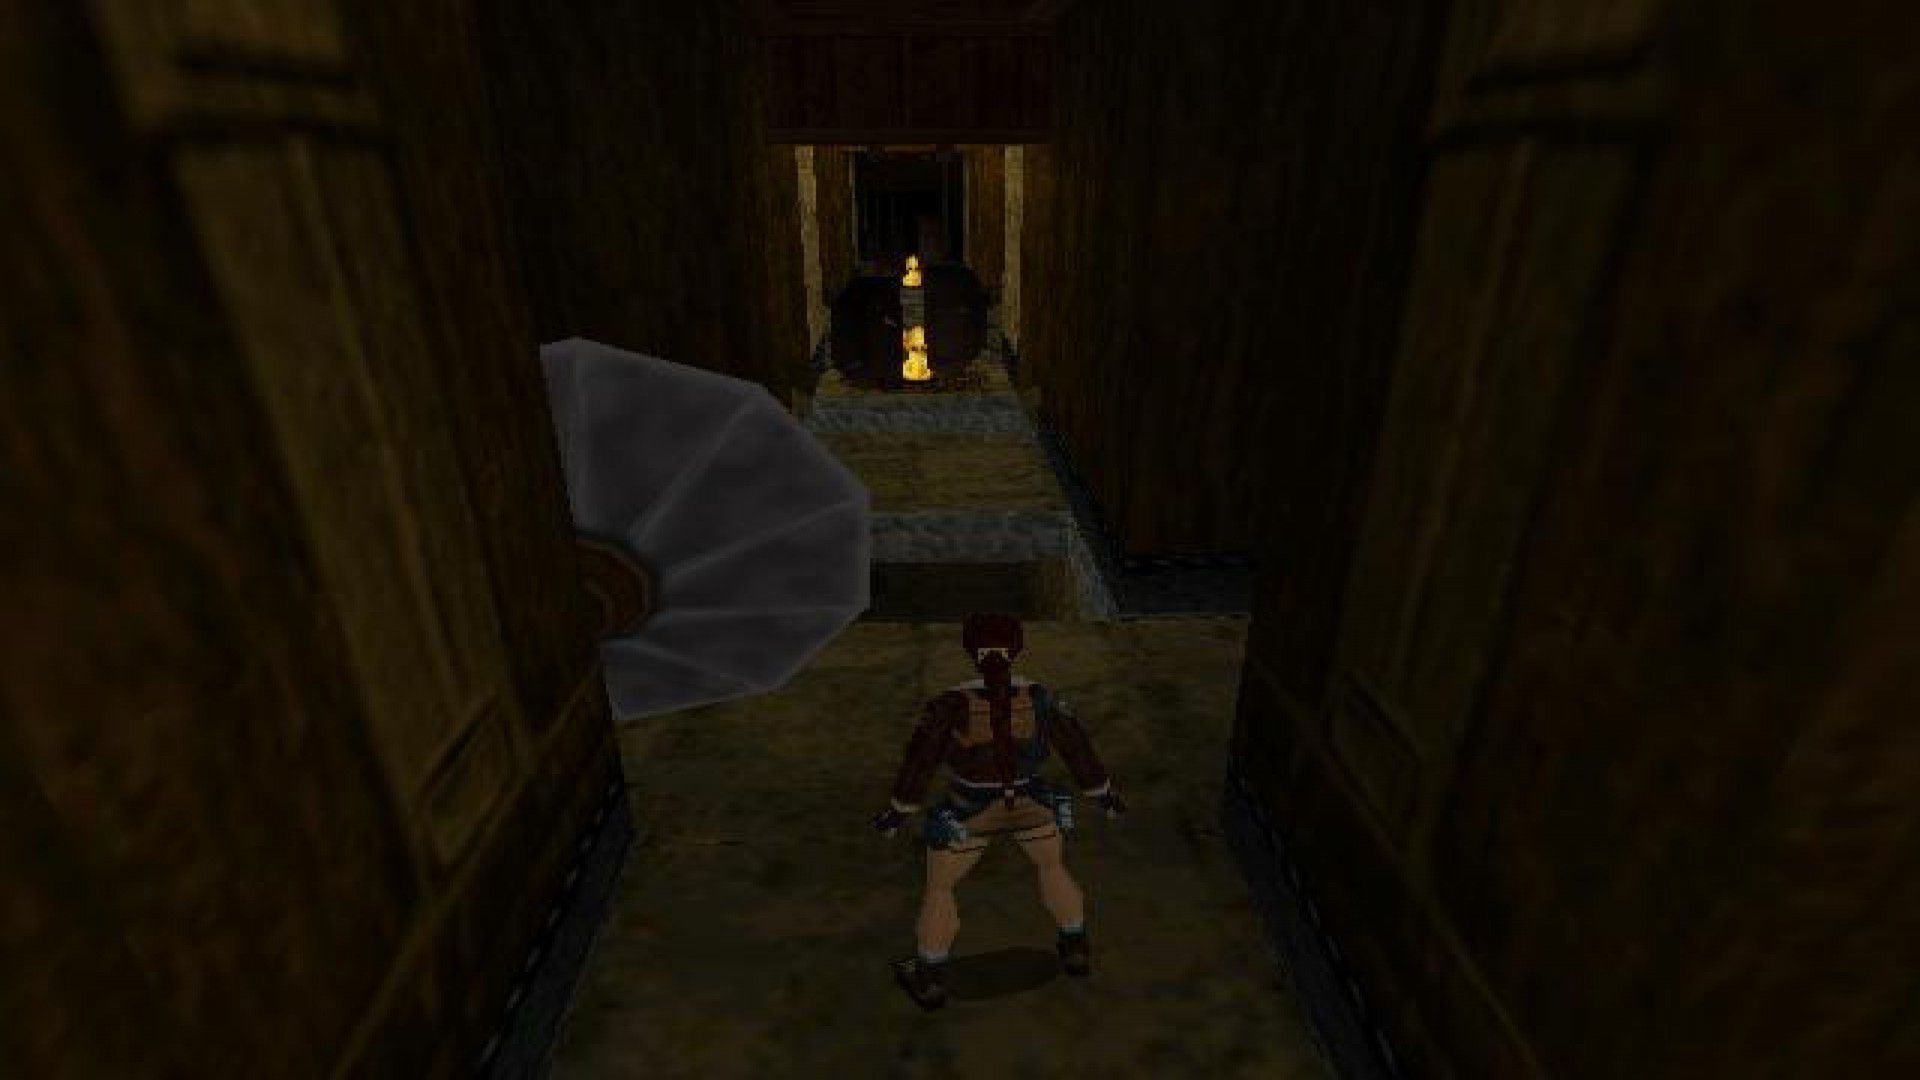 Lara Croft approaches a hallway trap in Tomb Raider II